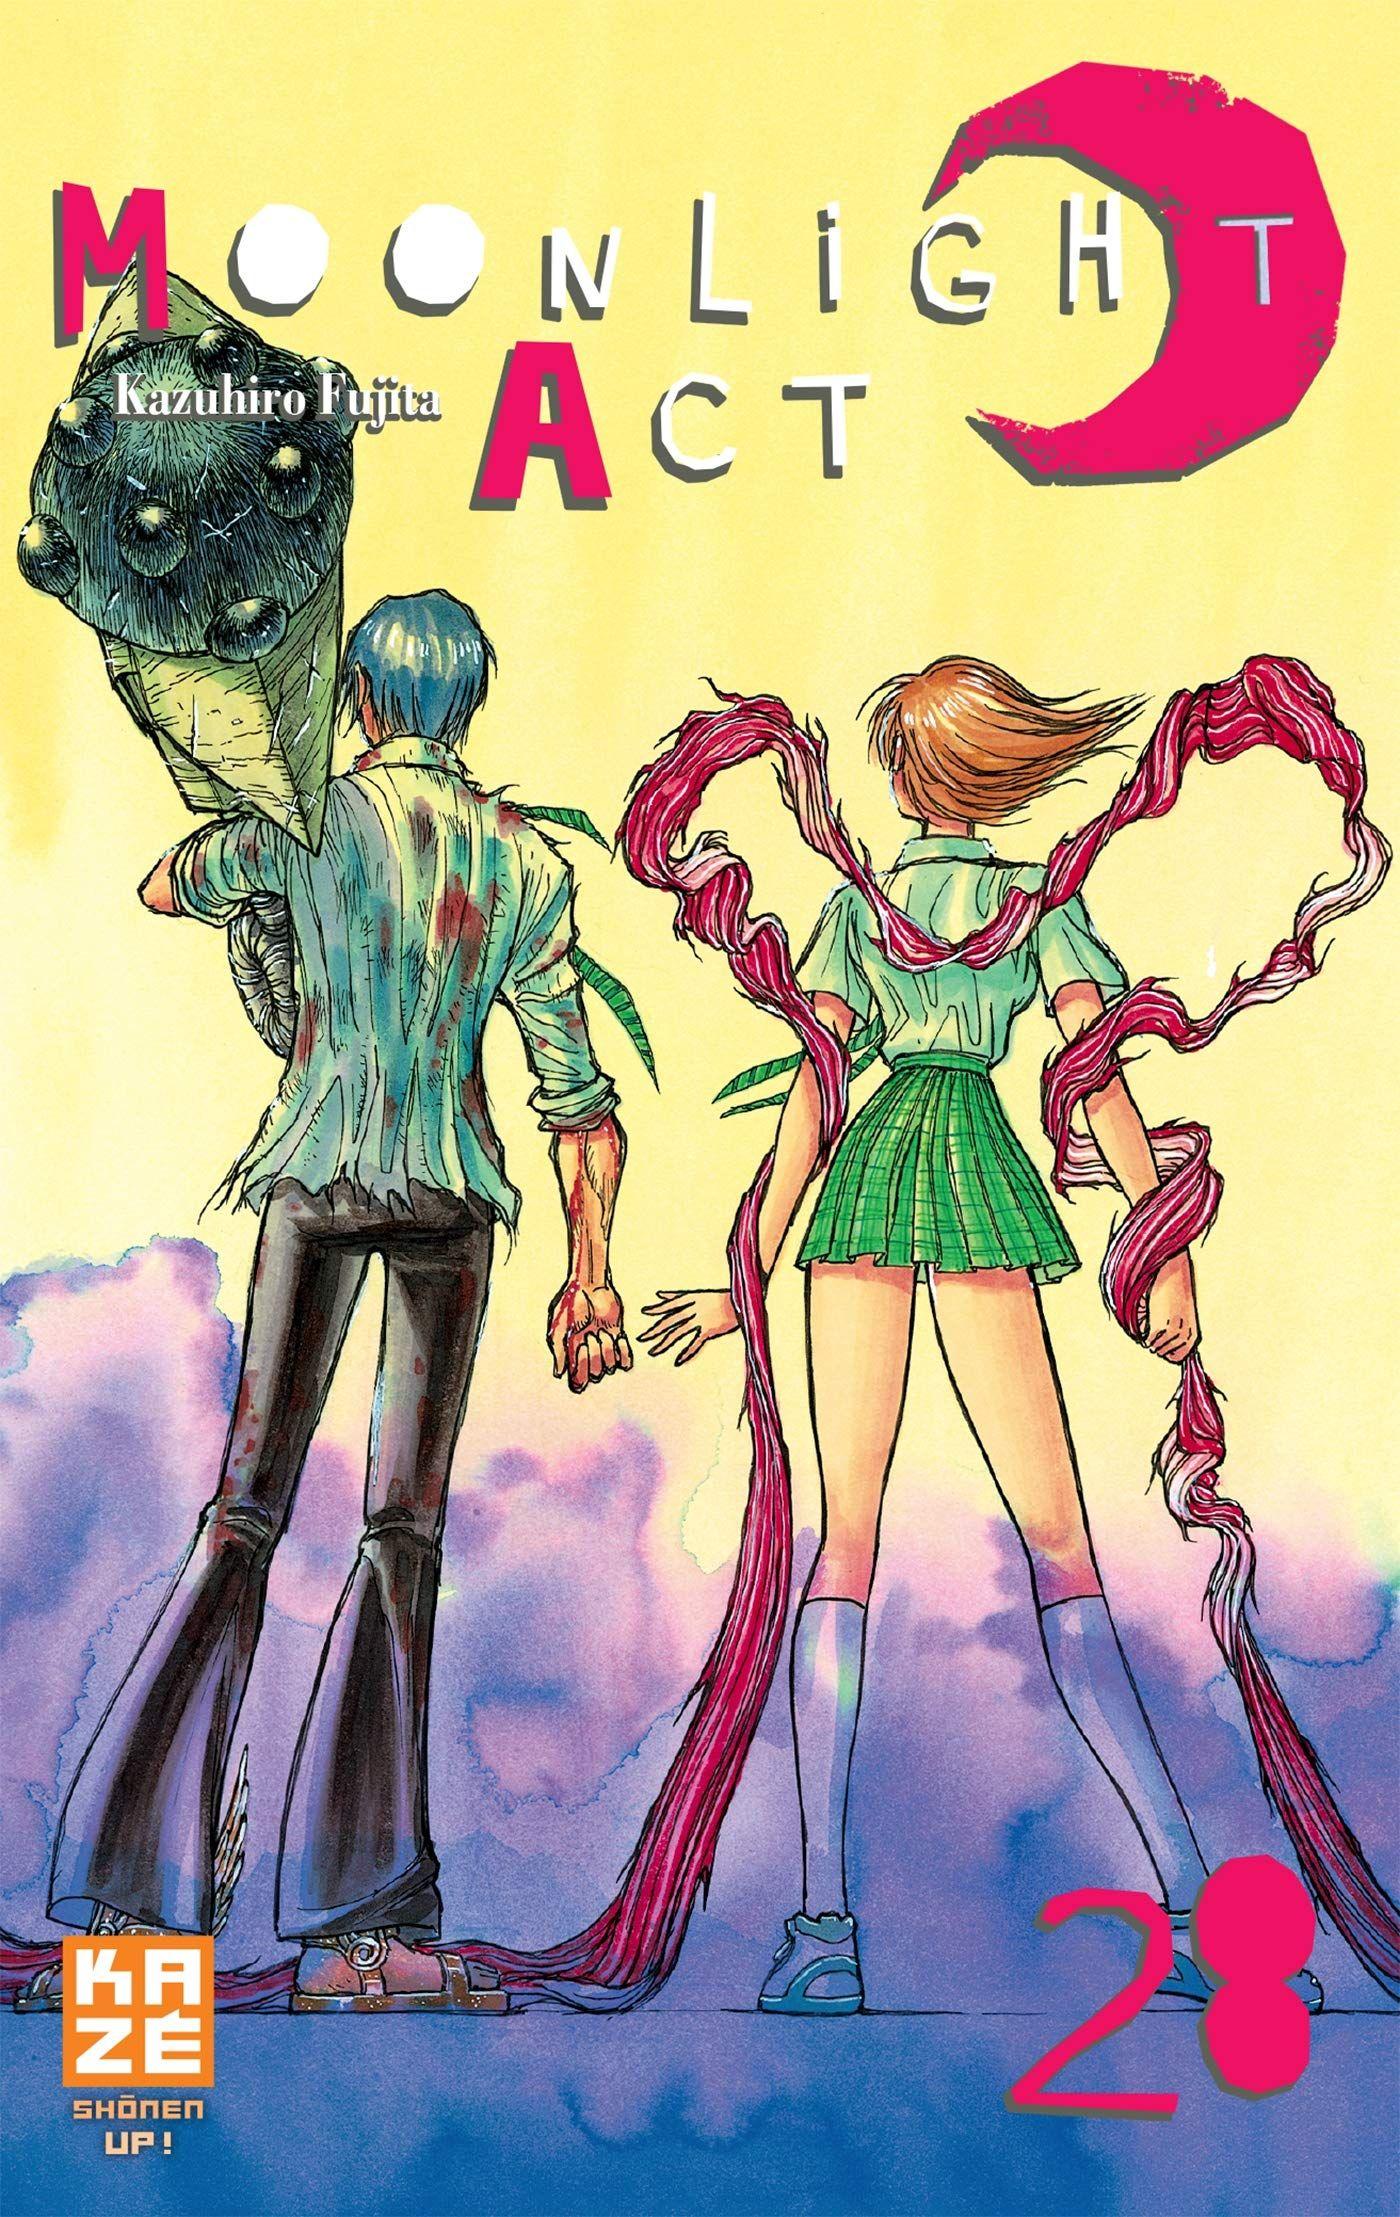 Sortie Manga au Québec JUIN 2021 Moonlight_Act_28_kaze